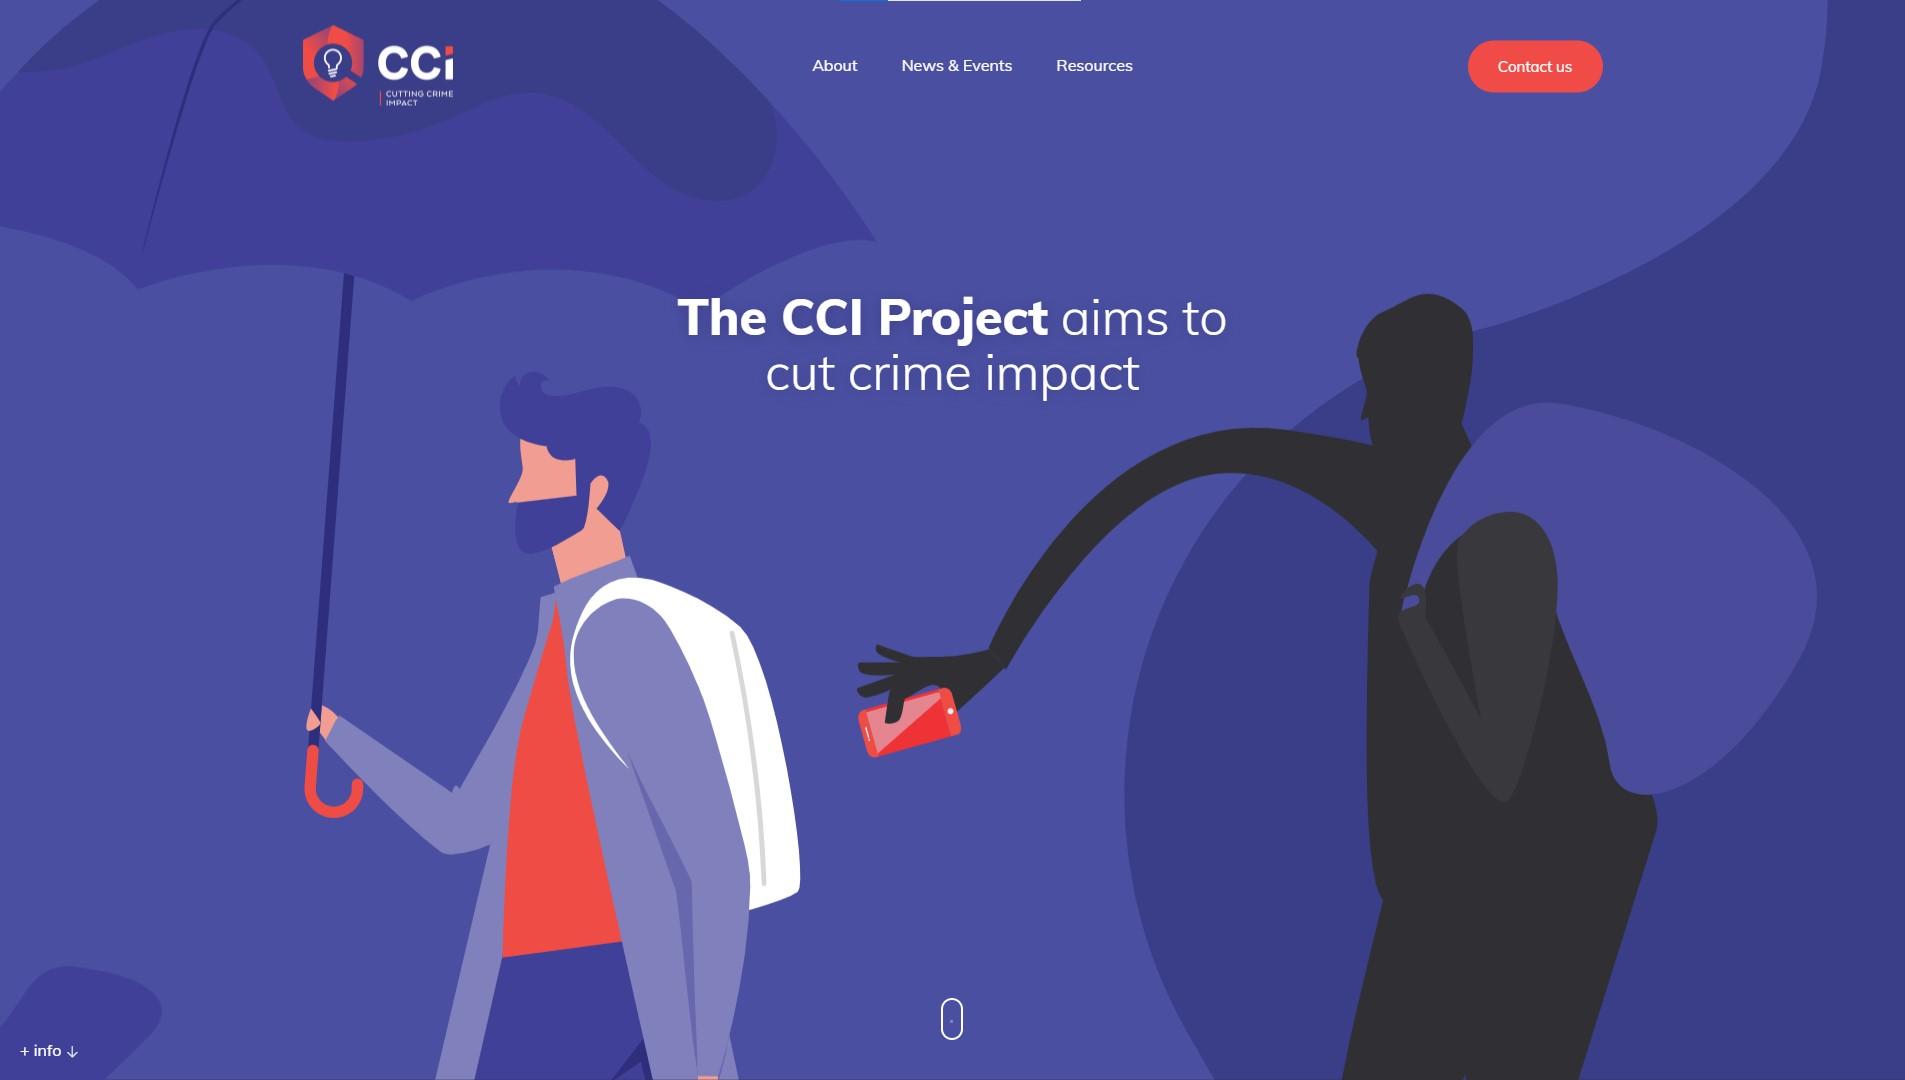 Orpetron Web Design Awards - CCI – Cutting Crime Impact - Web Design Awards Inspiration Trends UI UX